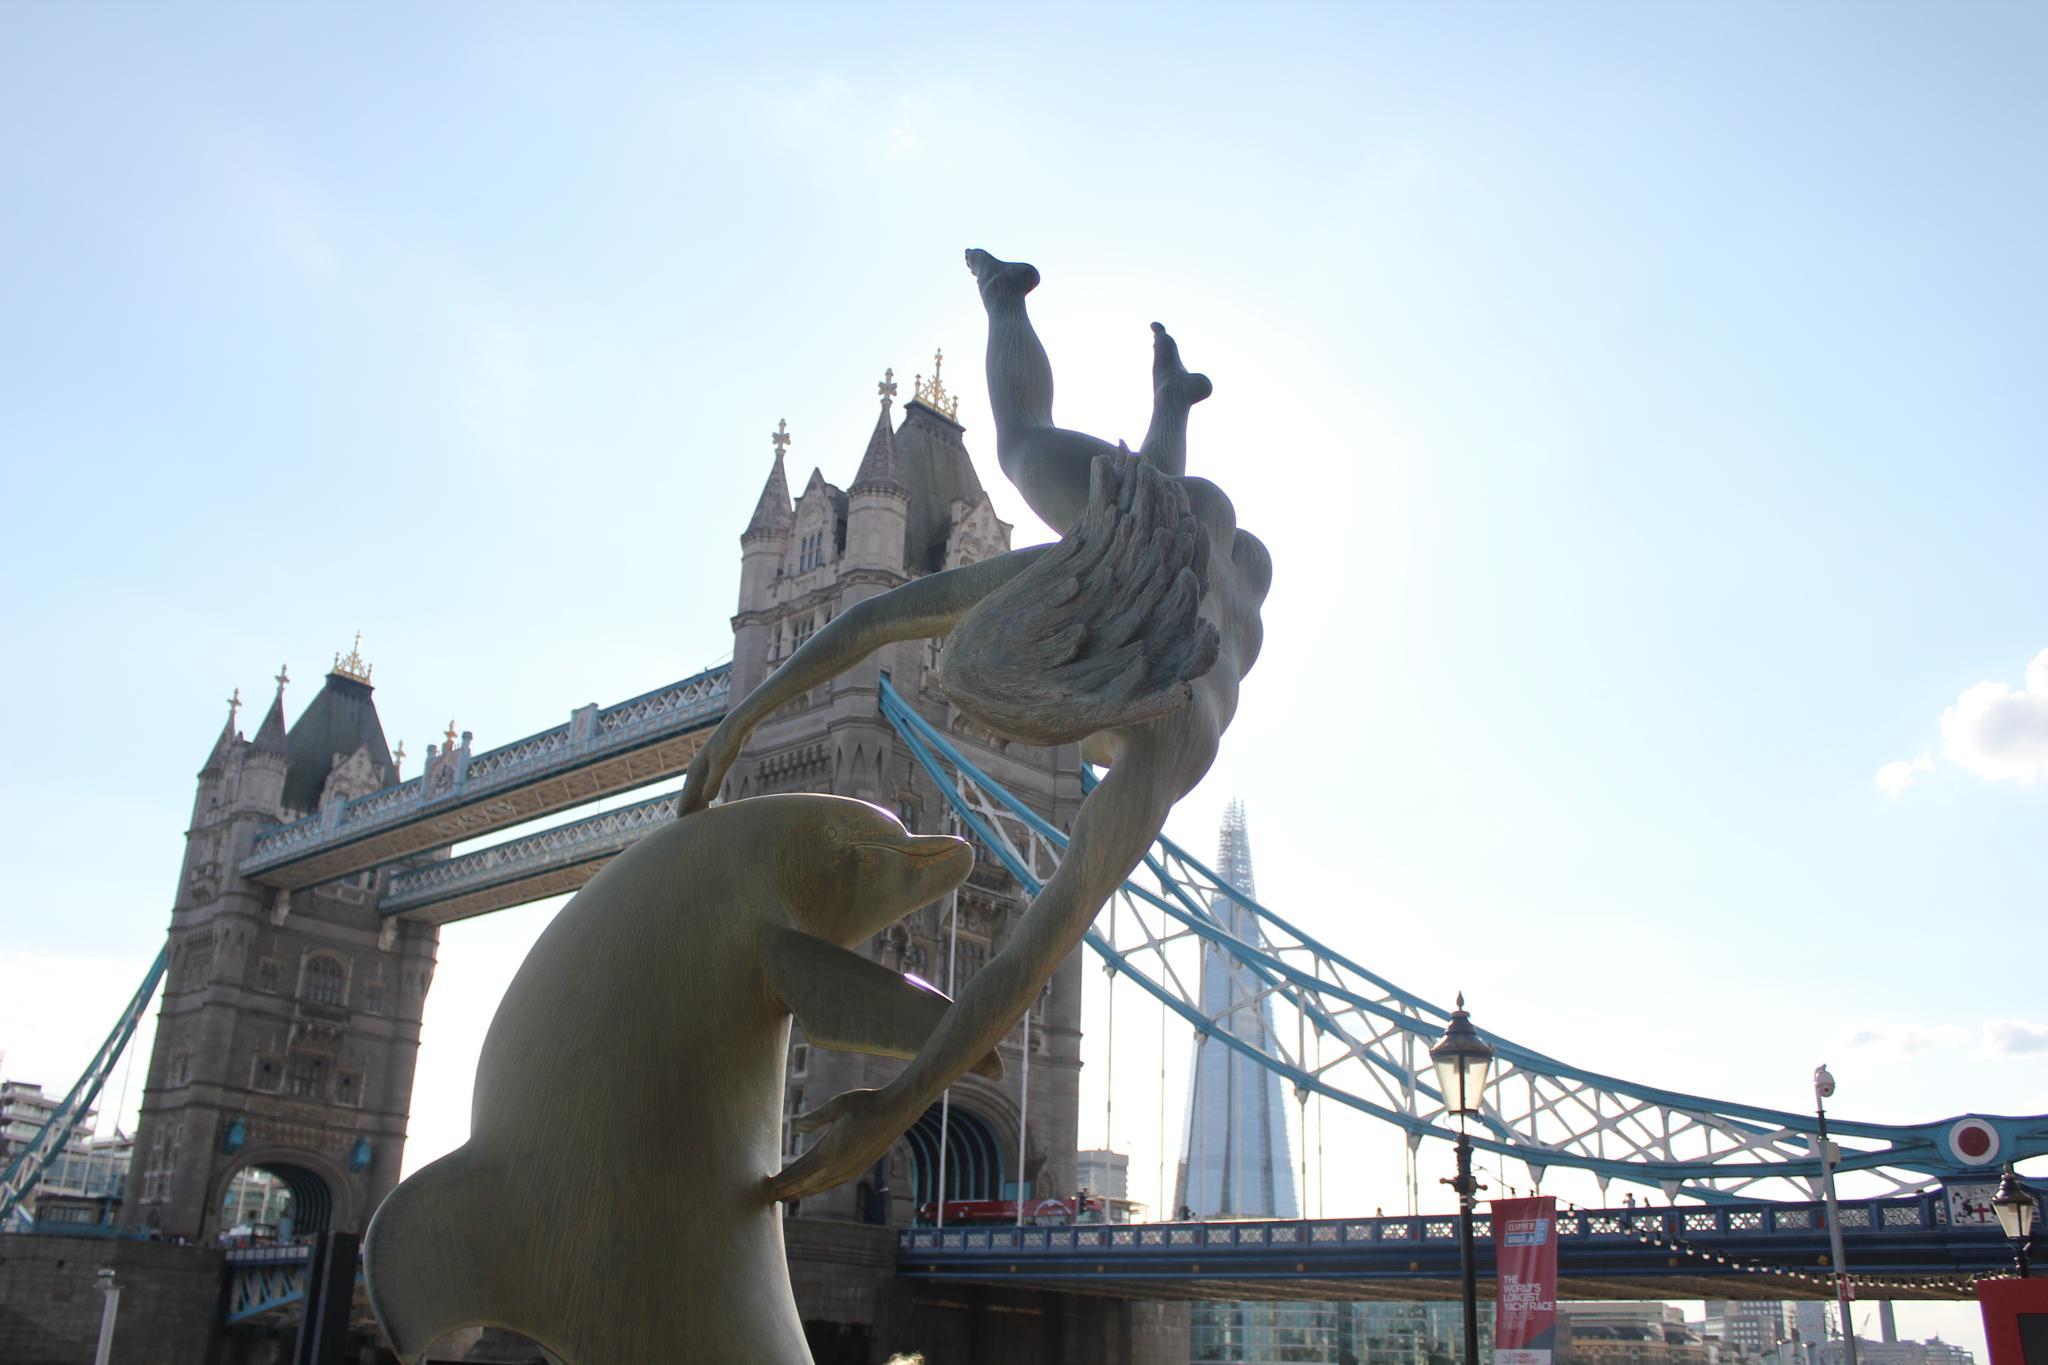 Girl & Dolphin, St Katherine Dock 2 by colin.savidge